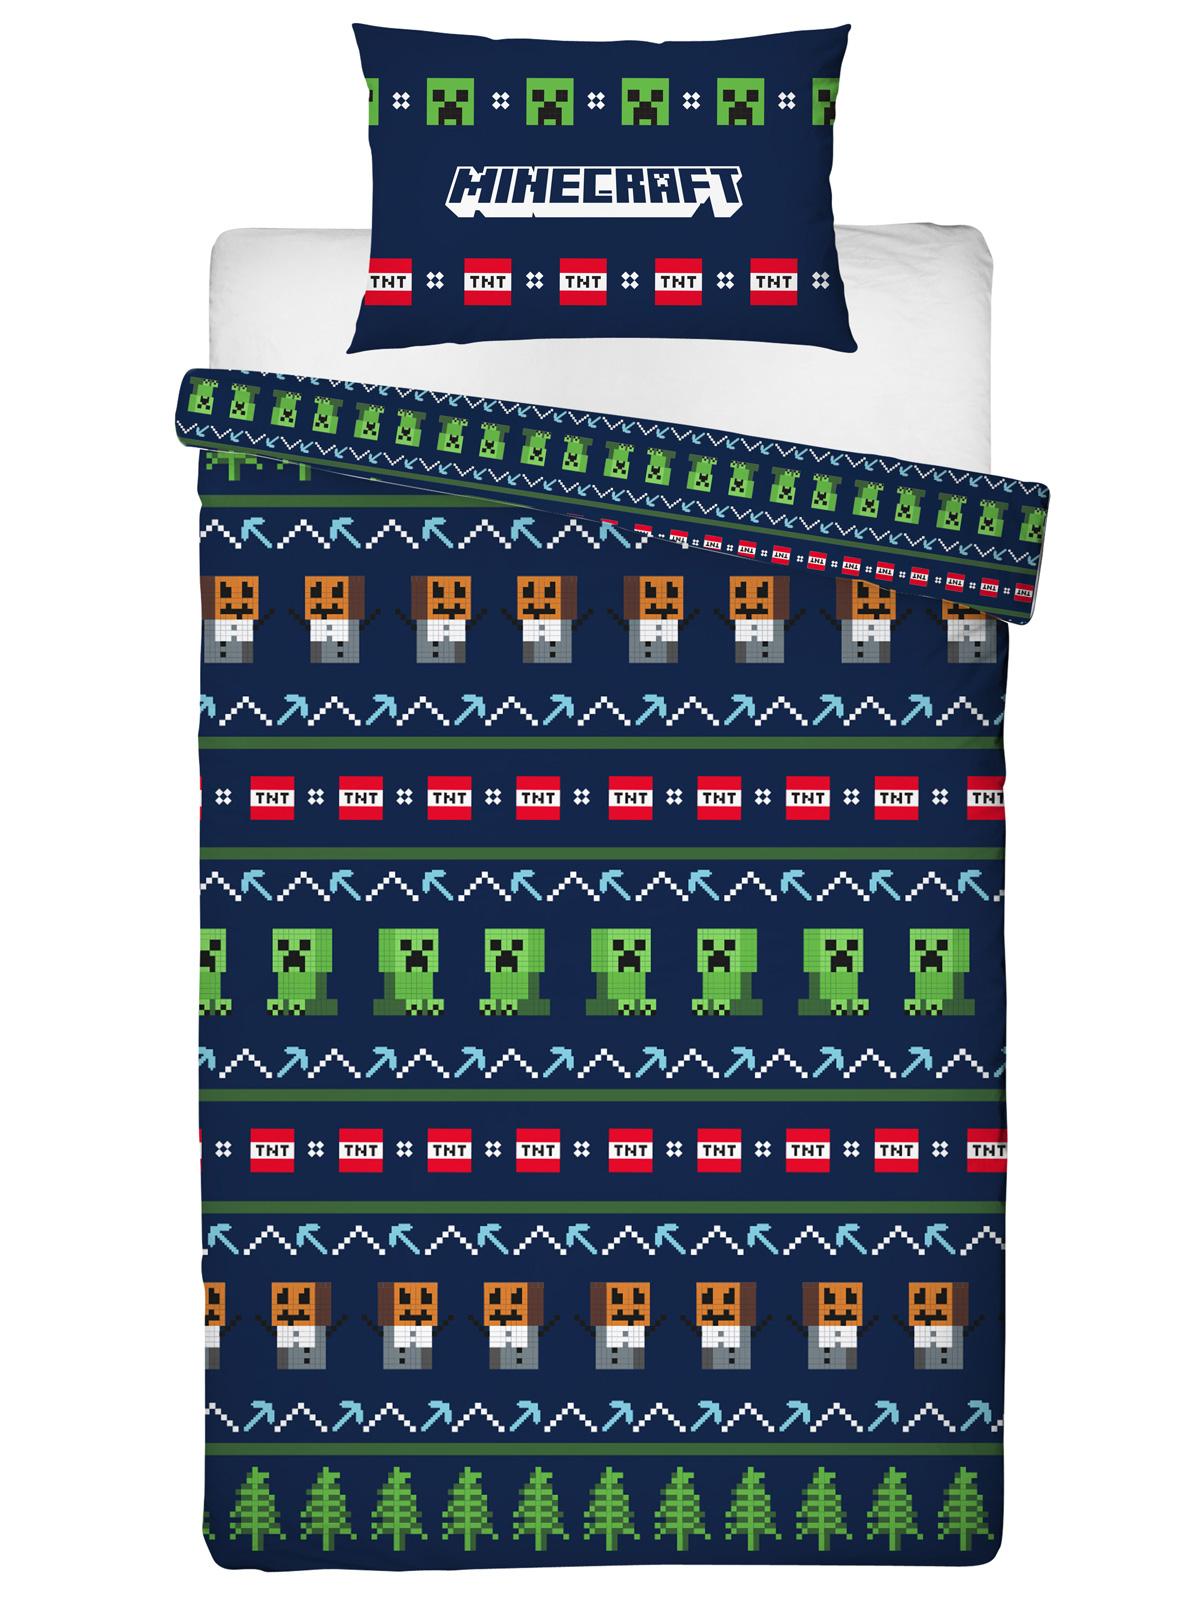 Minecraft Alpine Single Duvet Cover and Pillowcase Set